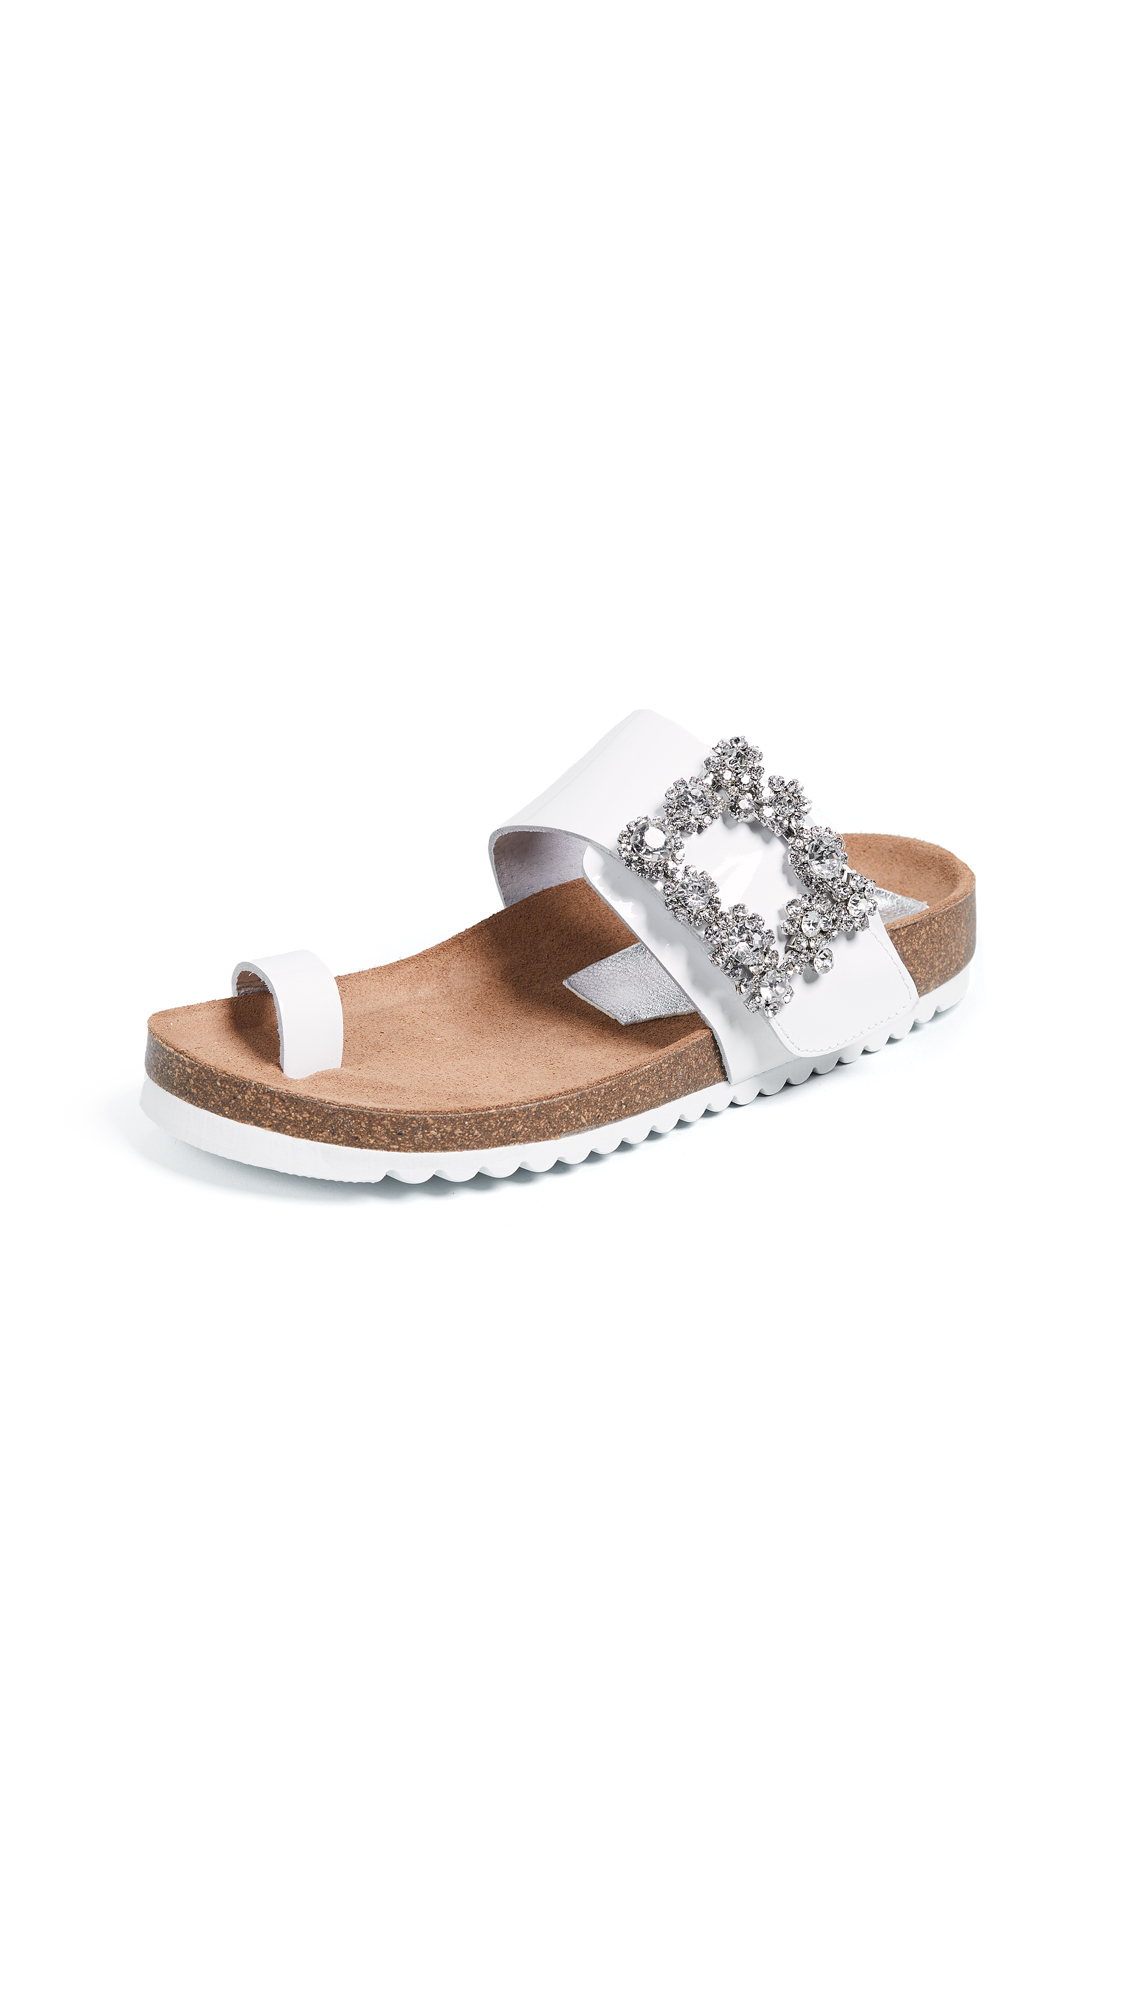 Jeffrey Campbell Bianca Toe Ring Slides - White/Silver